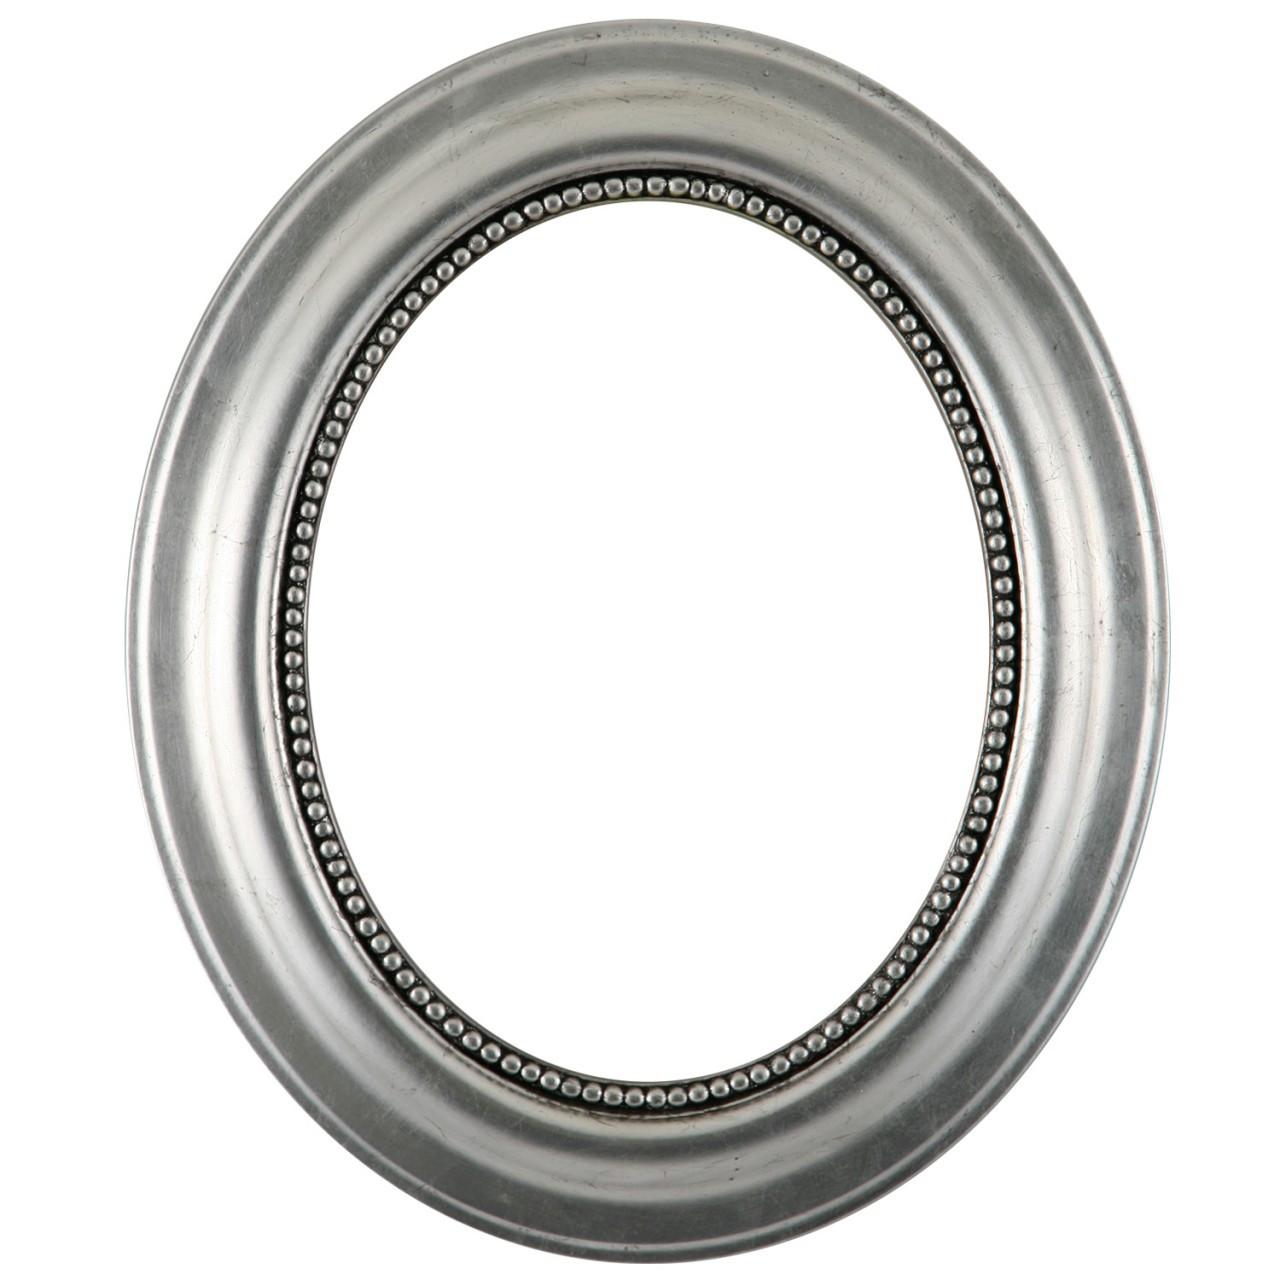 Oval Frame In Silver Leaf Finish With Black Antique Black